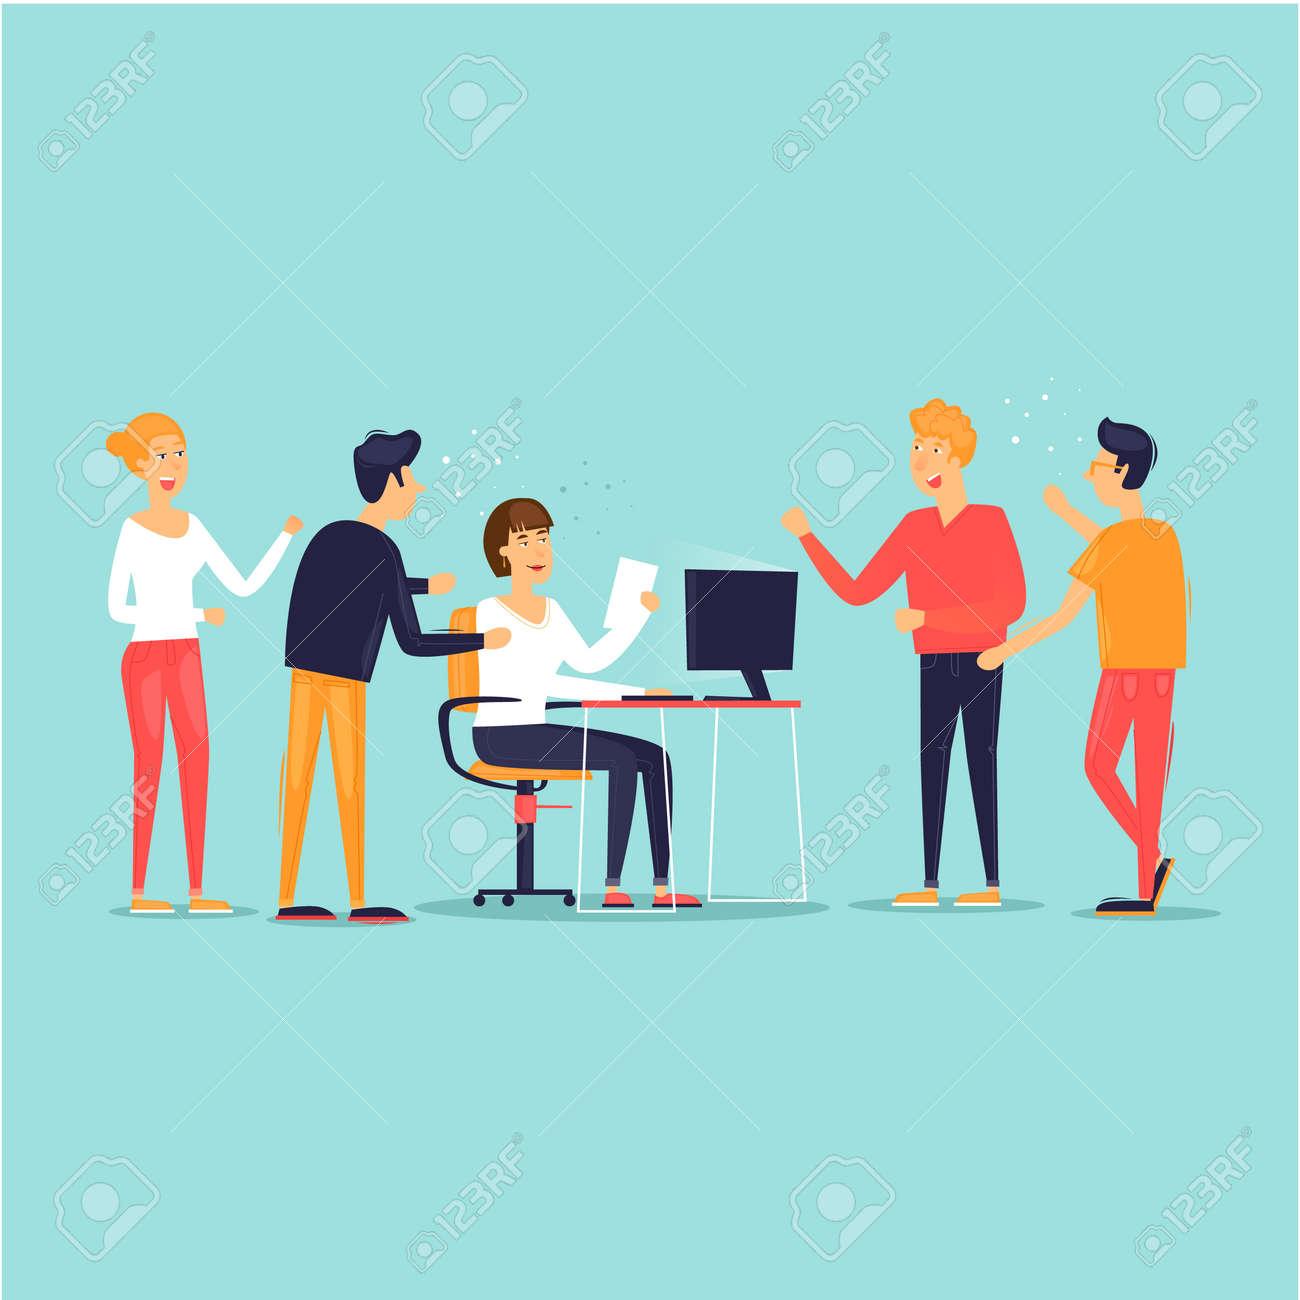 Teamwork, startup, support, data analysis, brainstorming, meeting. Flat design vector illustration. - 106105033